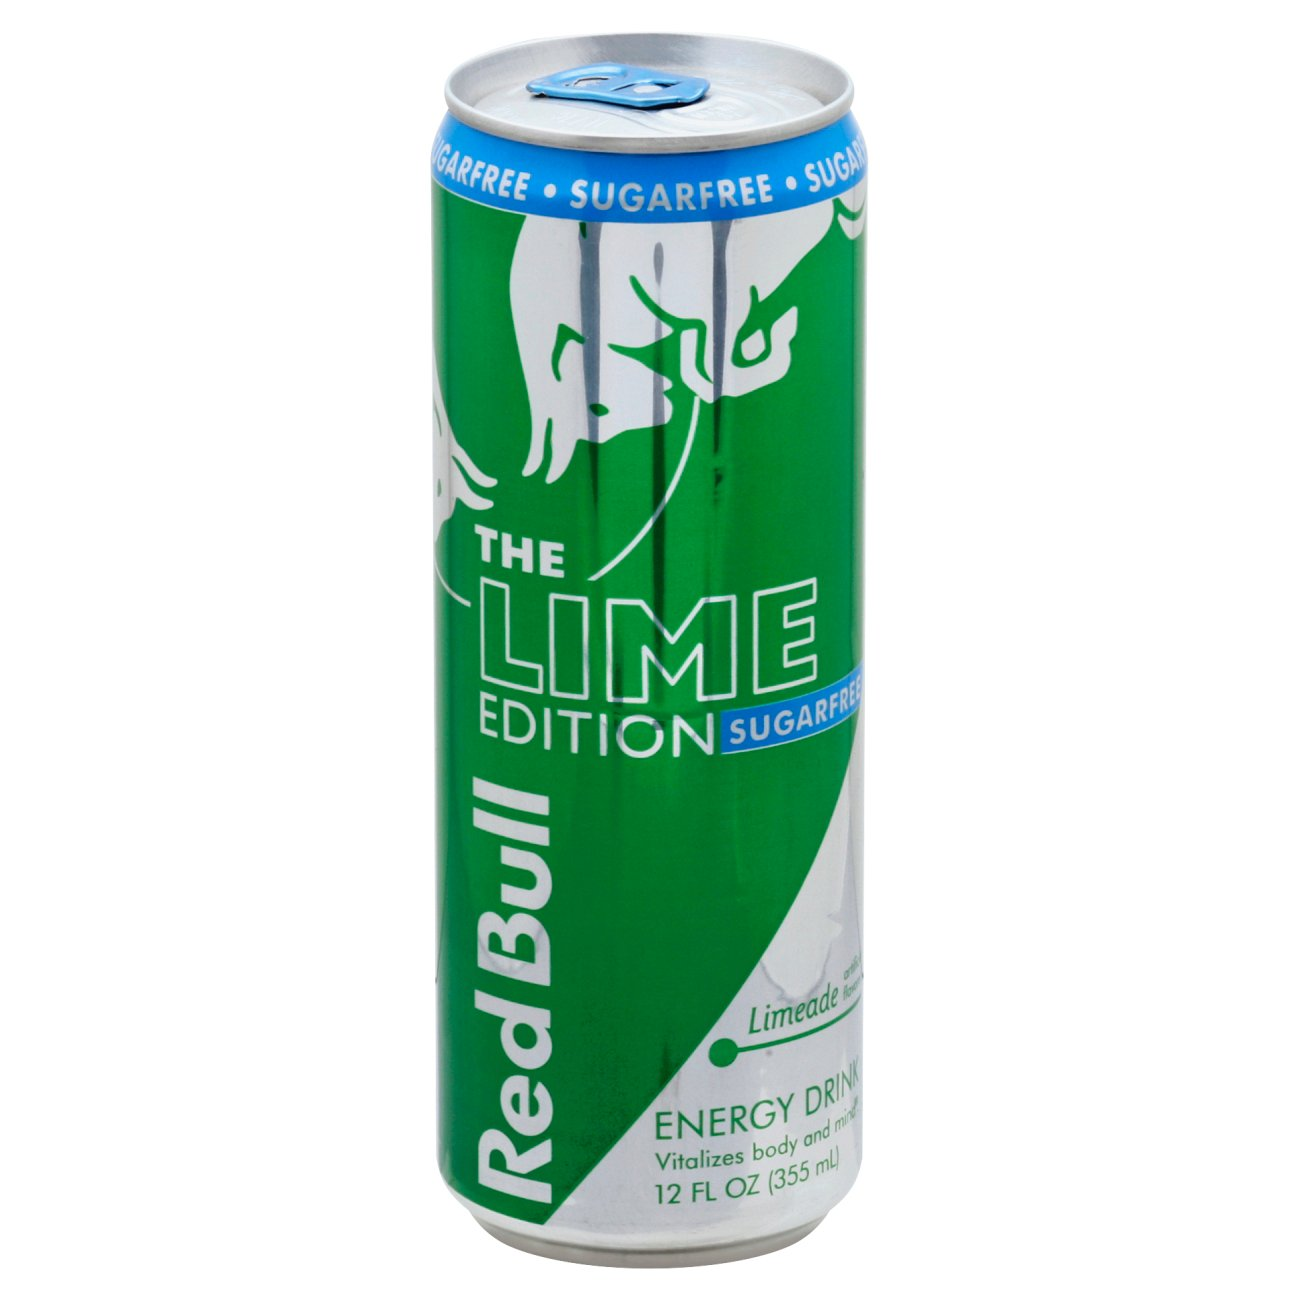 Lime Edition Limeade Energy Drink